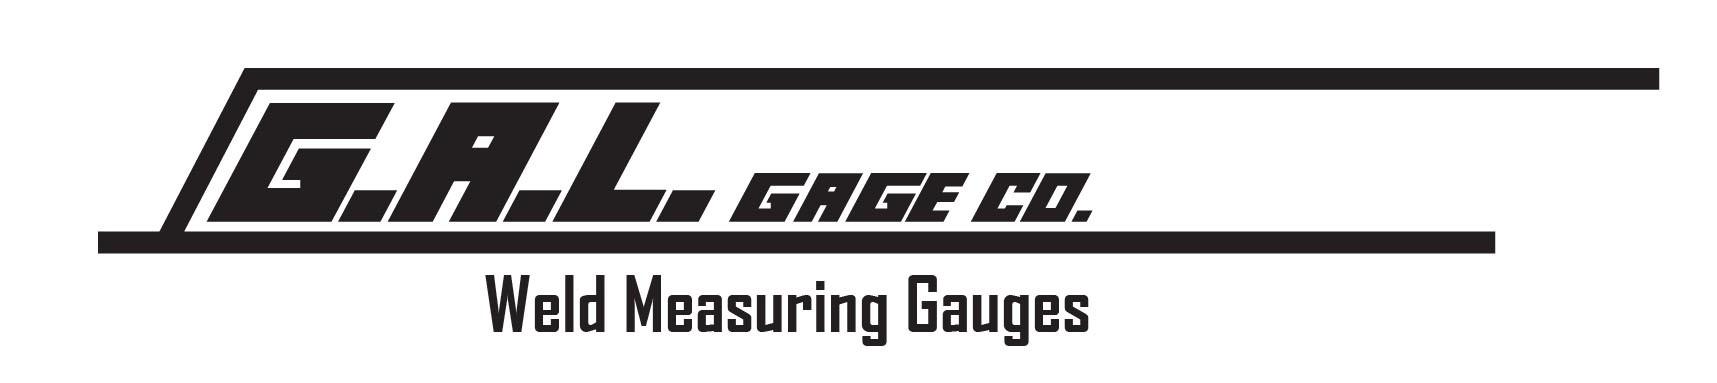 G.A.L Gage Co